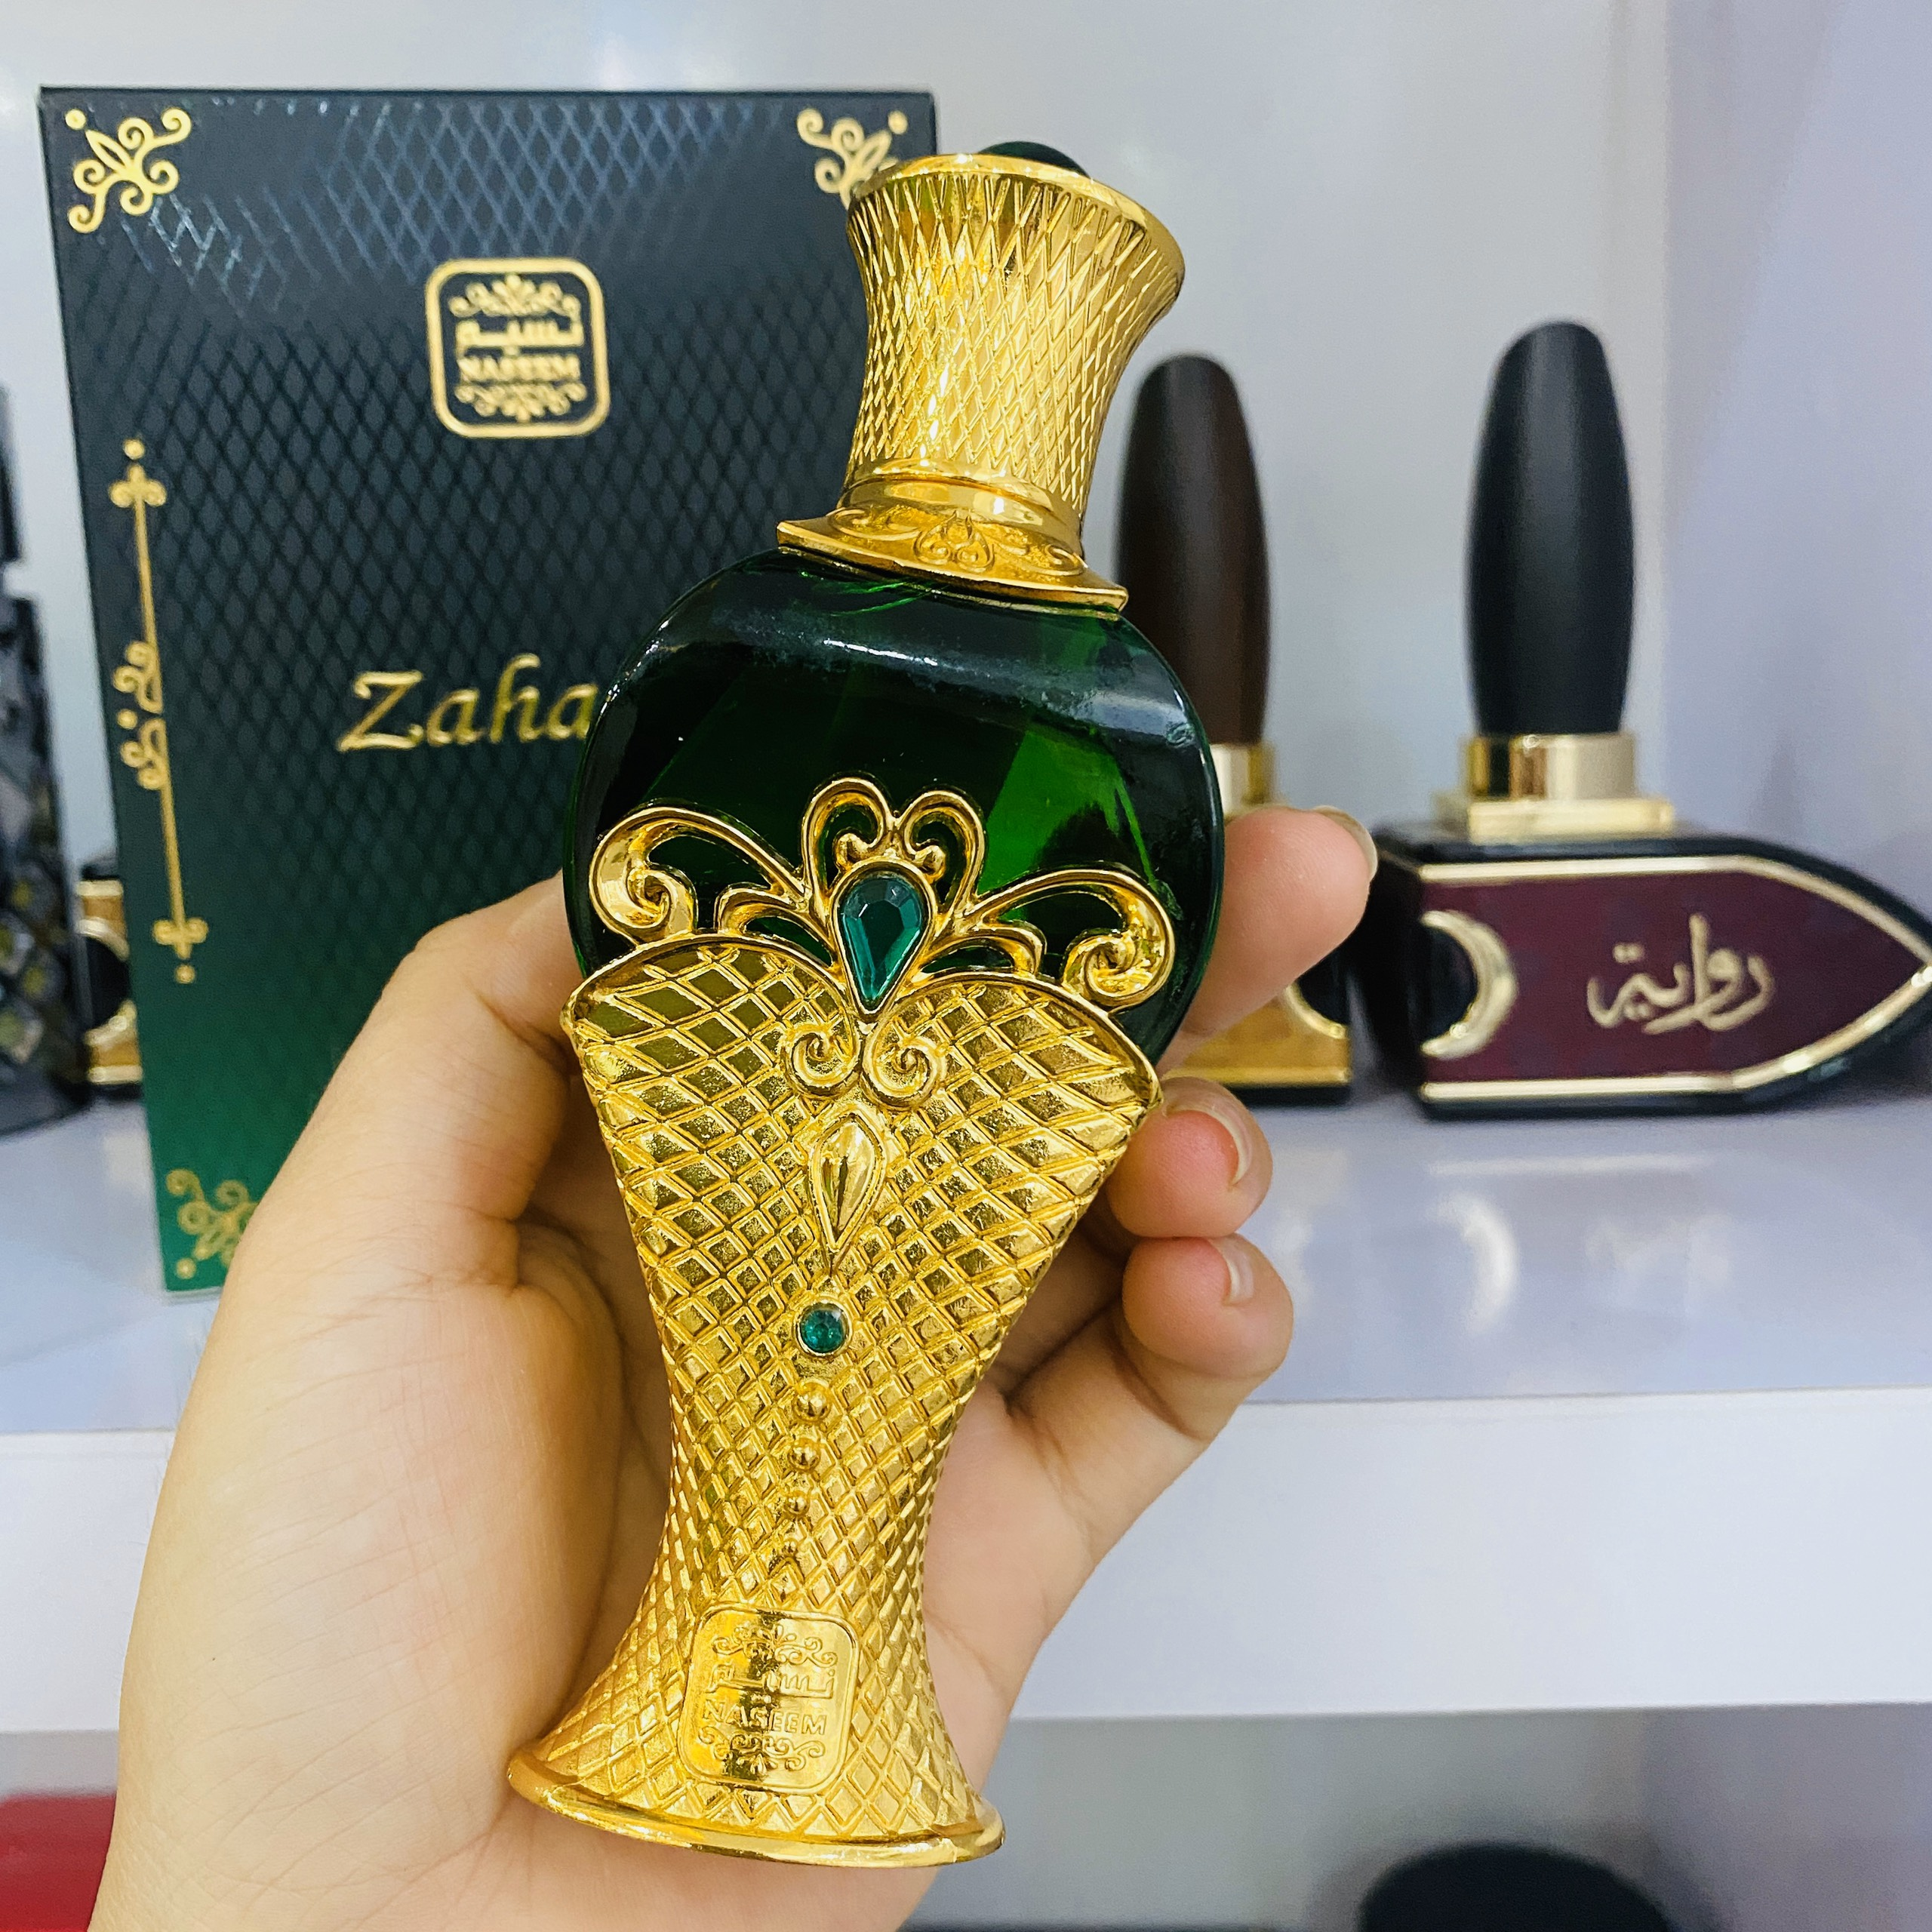 Tinh dầu nước hoa Dubai Zahabia